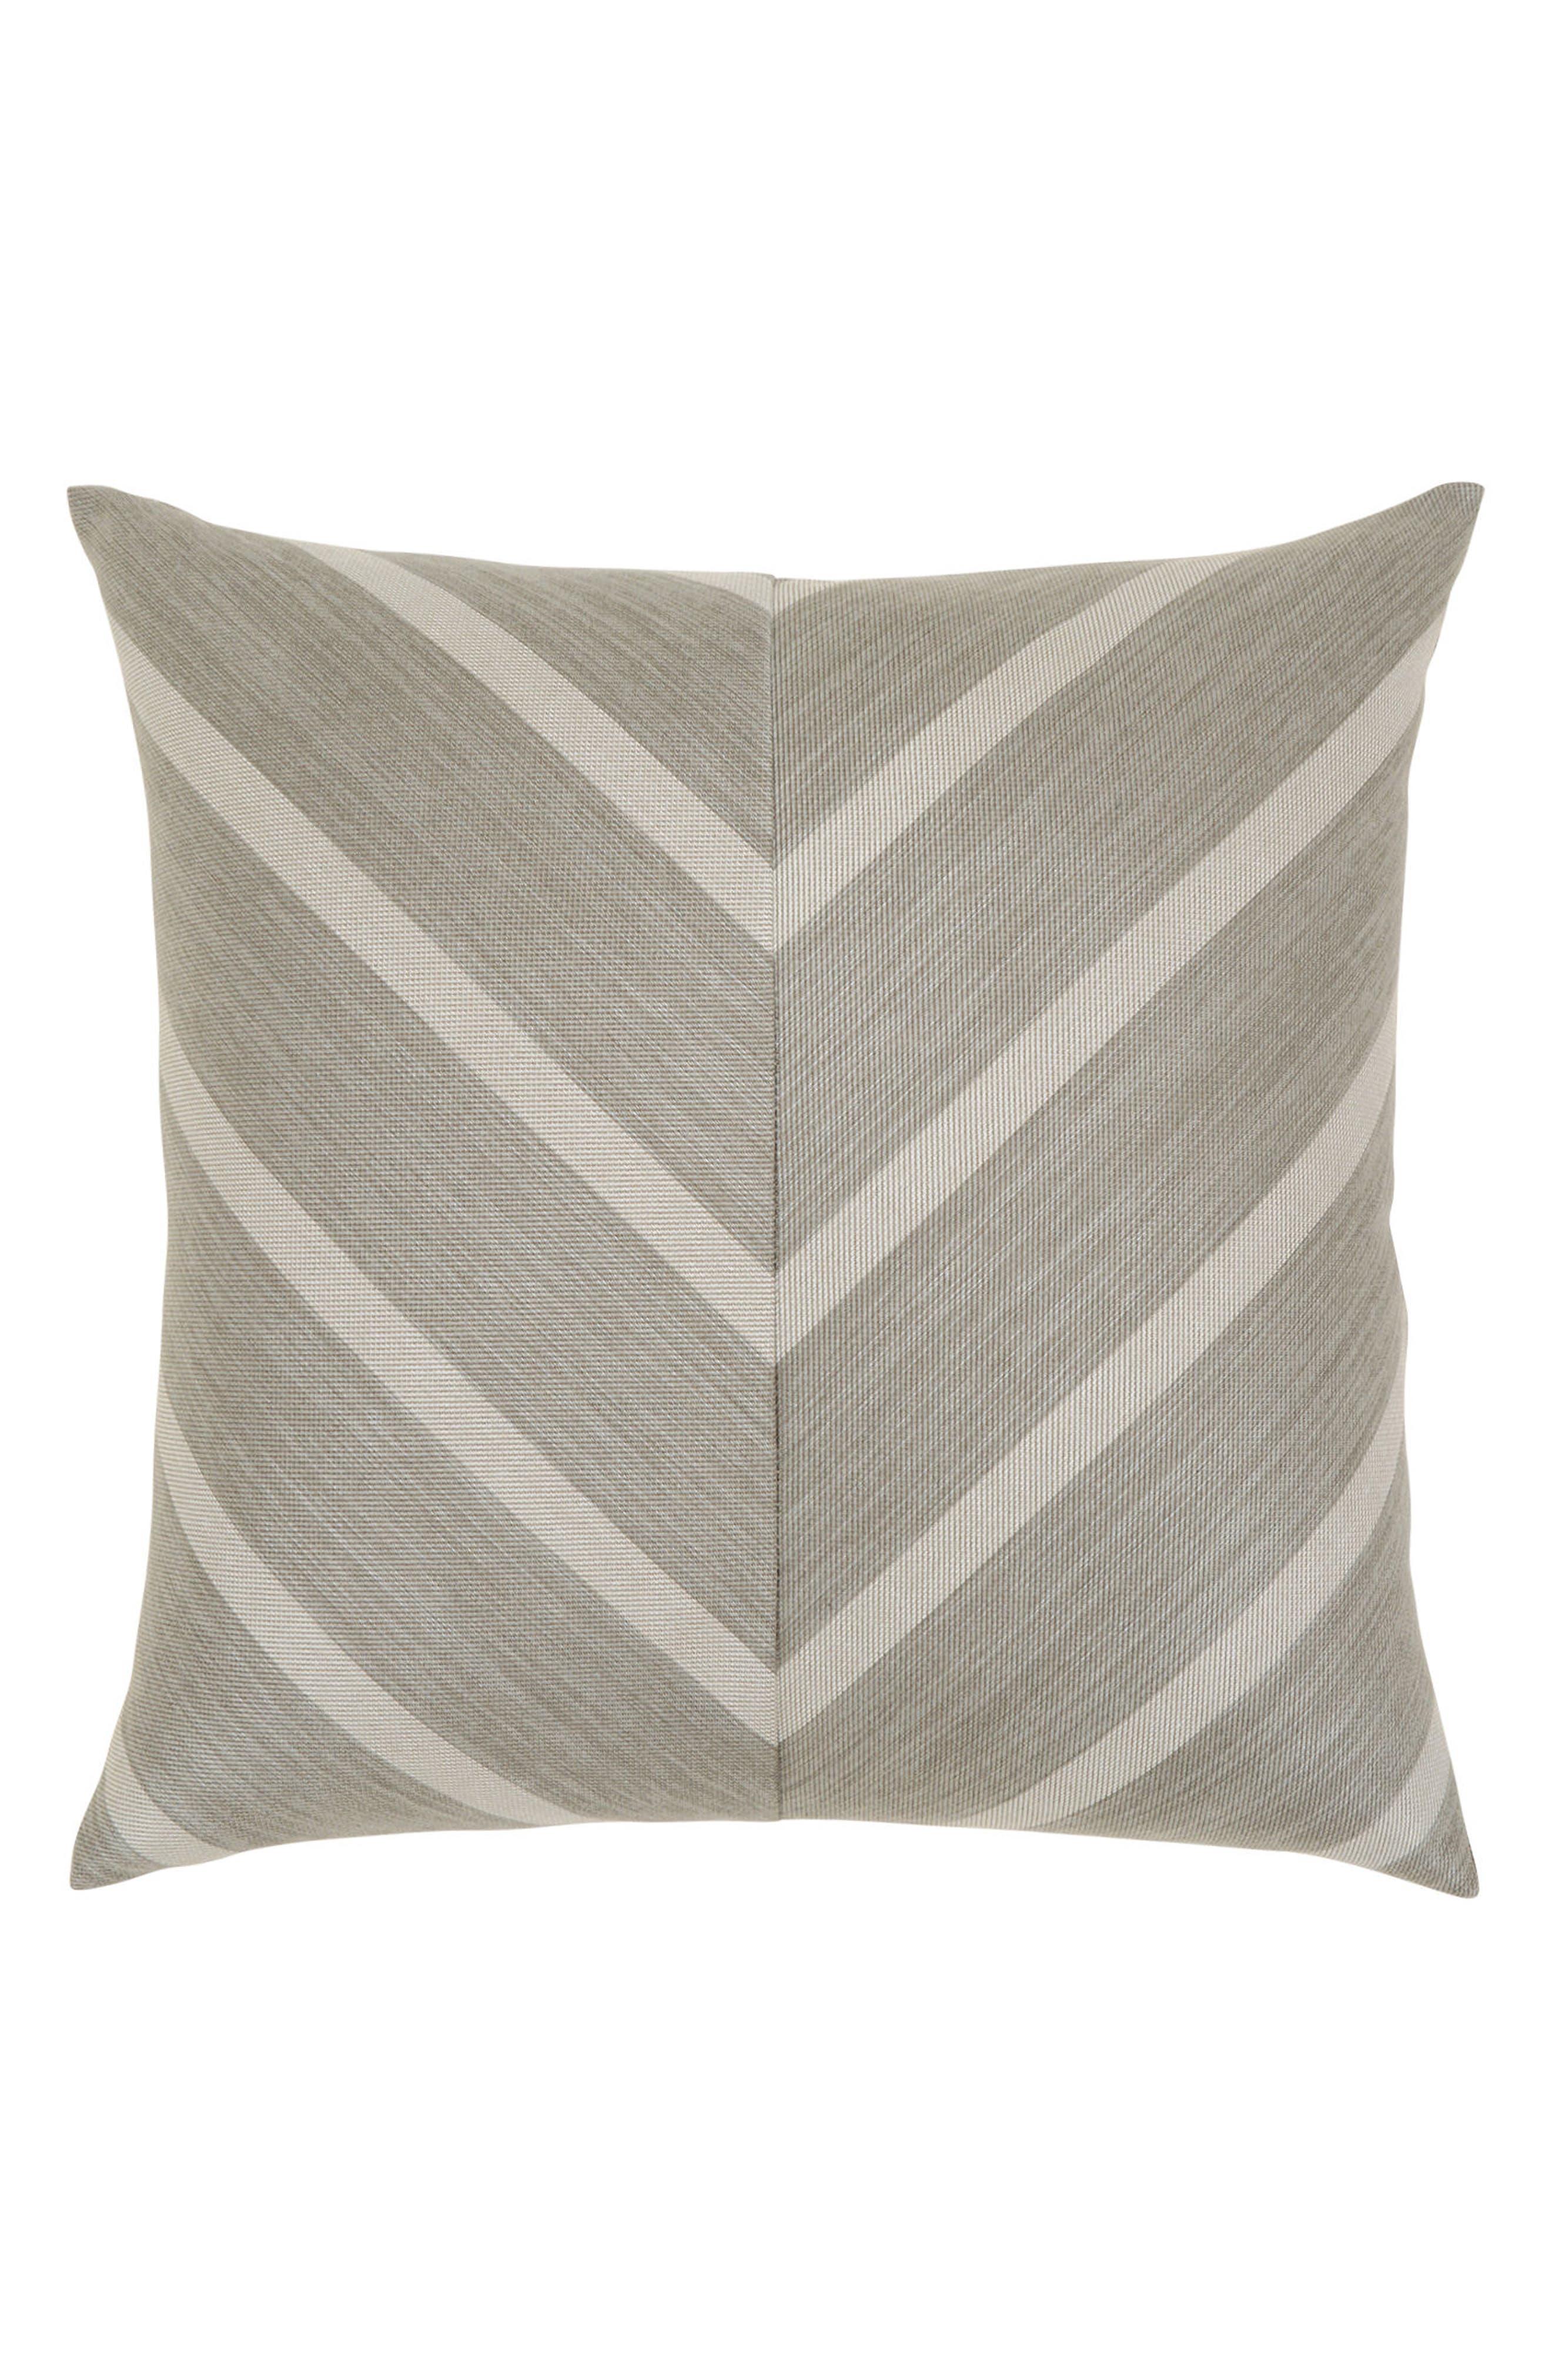 Sparkle Chevron Indoor/Outdoor Accent Pillow,                         Main,                         color, Grey